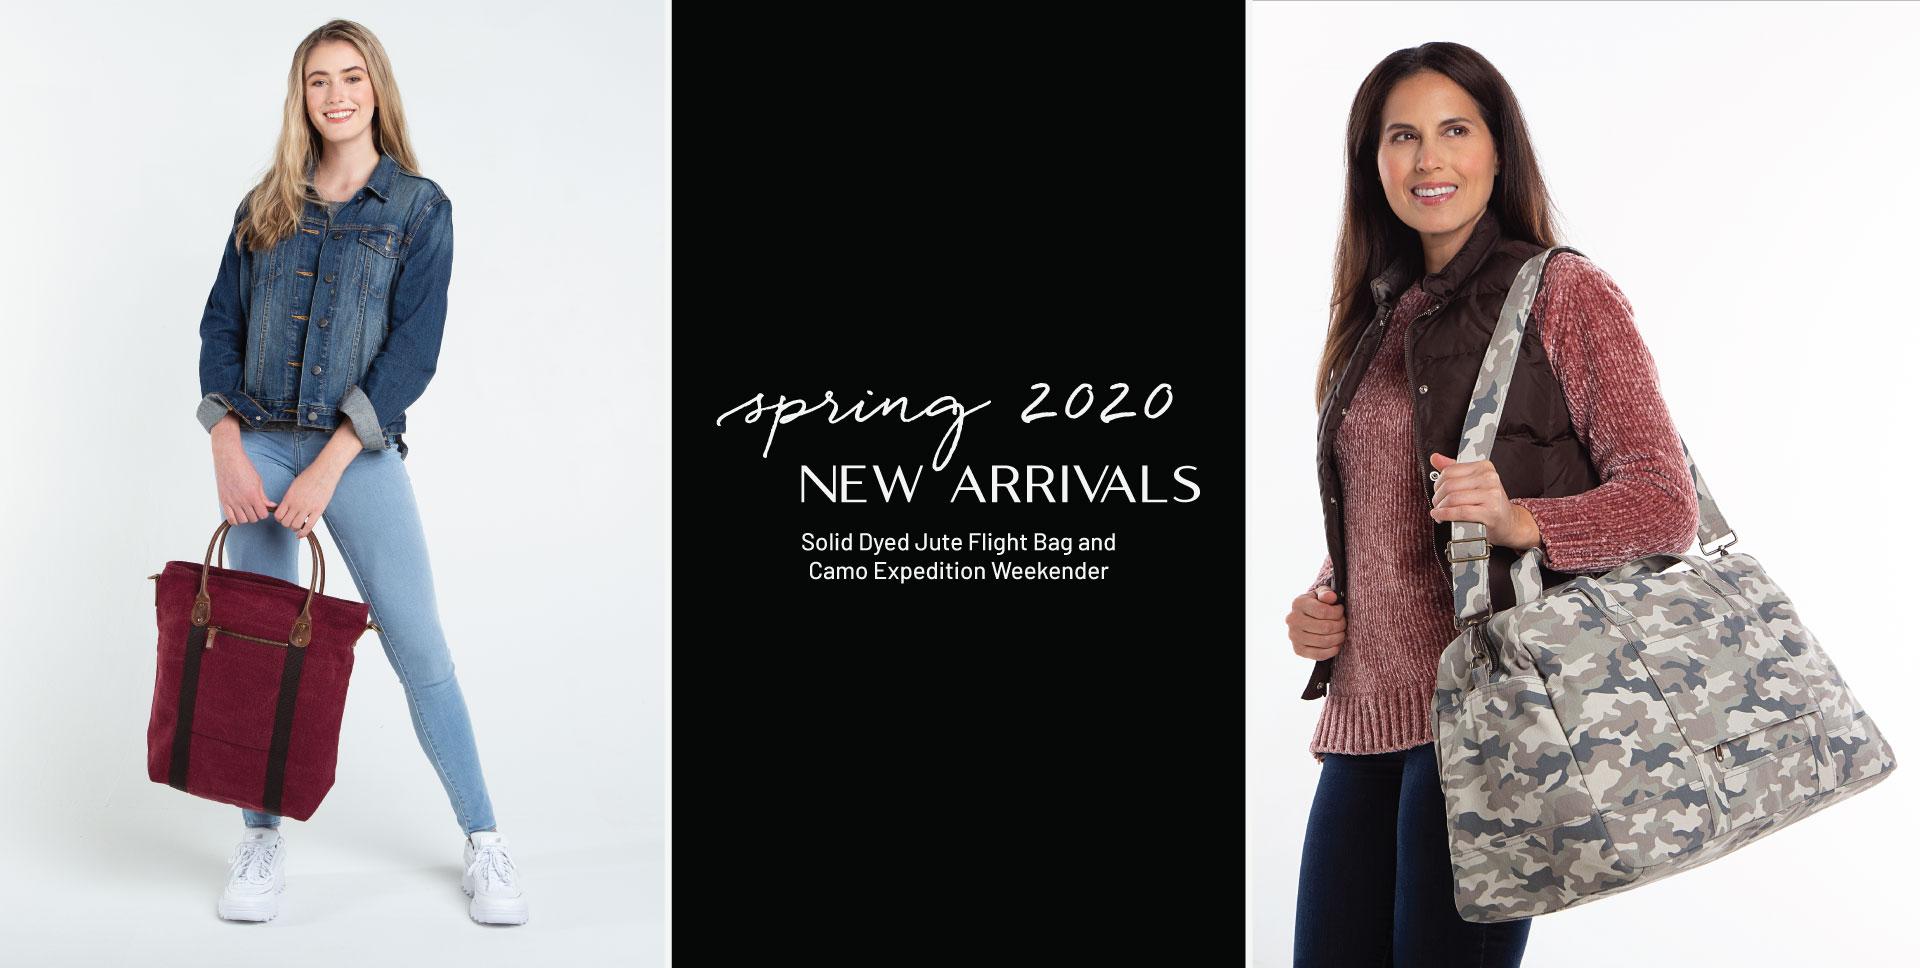 Spring 2020 New Arrivals